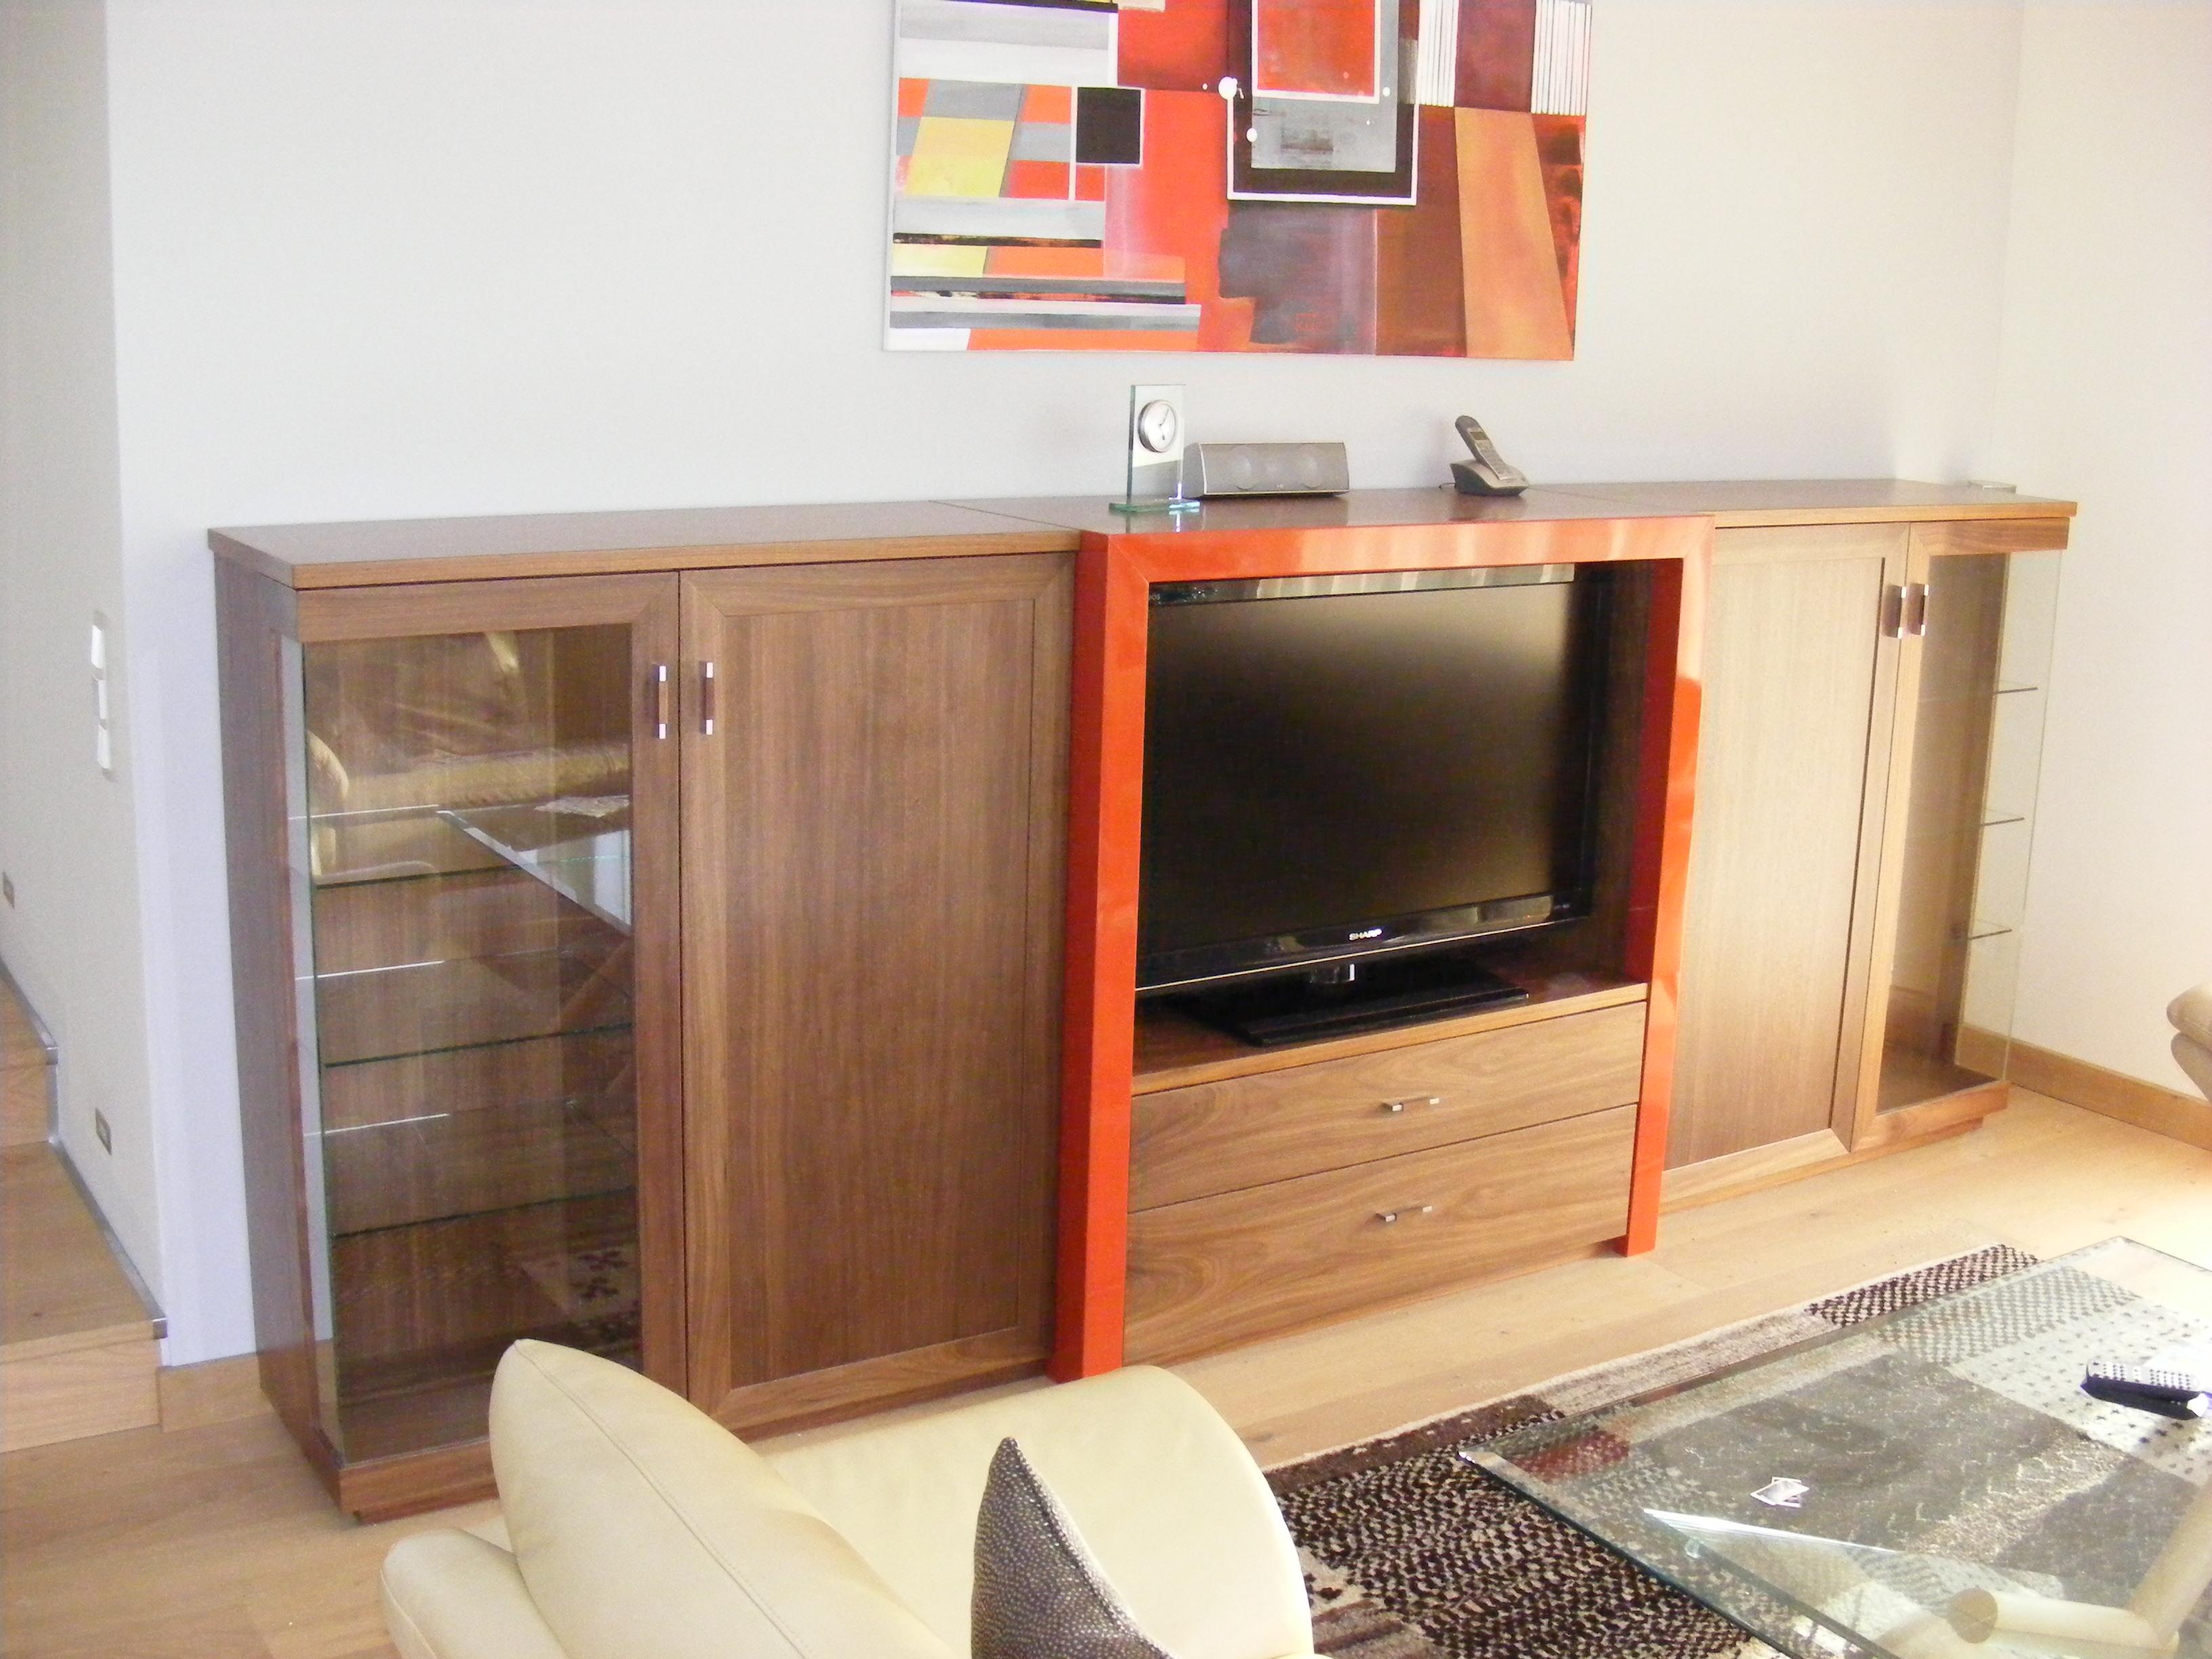 Möbel & Raumdesign Hemesath